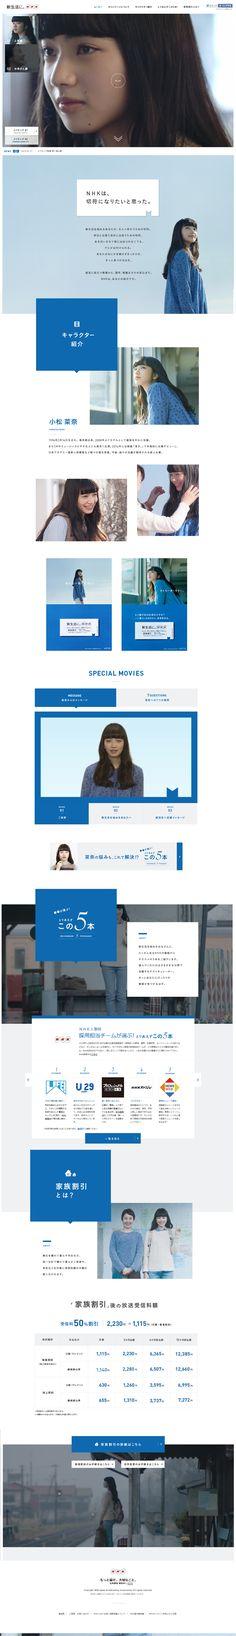 http://www.nhk.or.jp/haru/ シンプル / フラット /  ゴシック / 線 / 白 / 青 / 左ロゴ / キャッチコピー / タブ / スライダー / 価格表 / LP / 写真